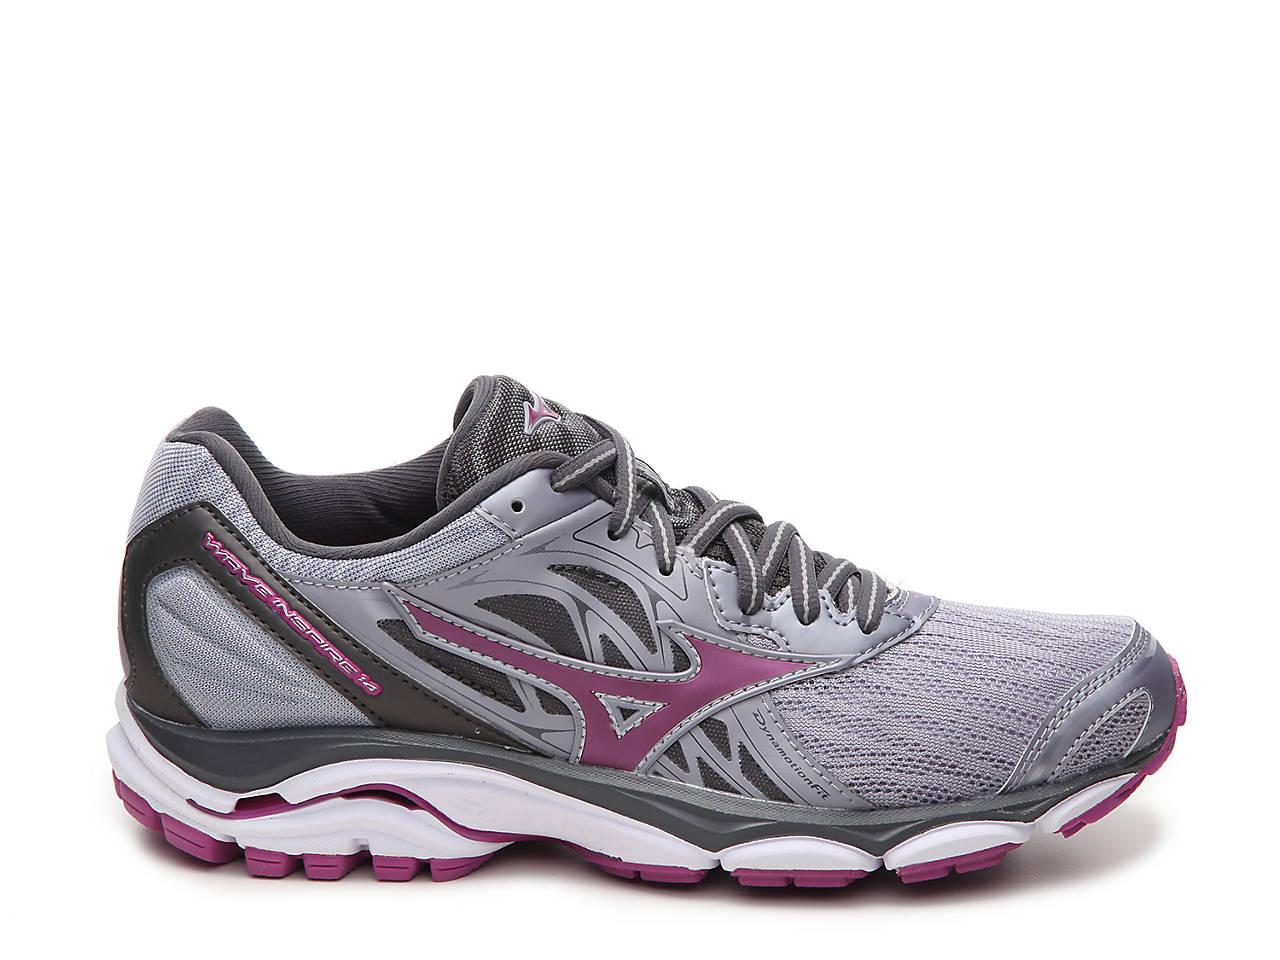 san francisco 3f07b 5edcd Wave Inspire 14 Performance Running Shoe - Women's